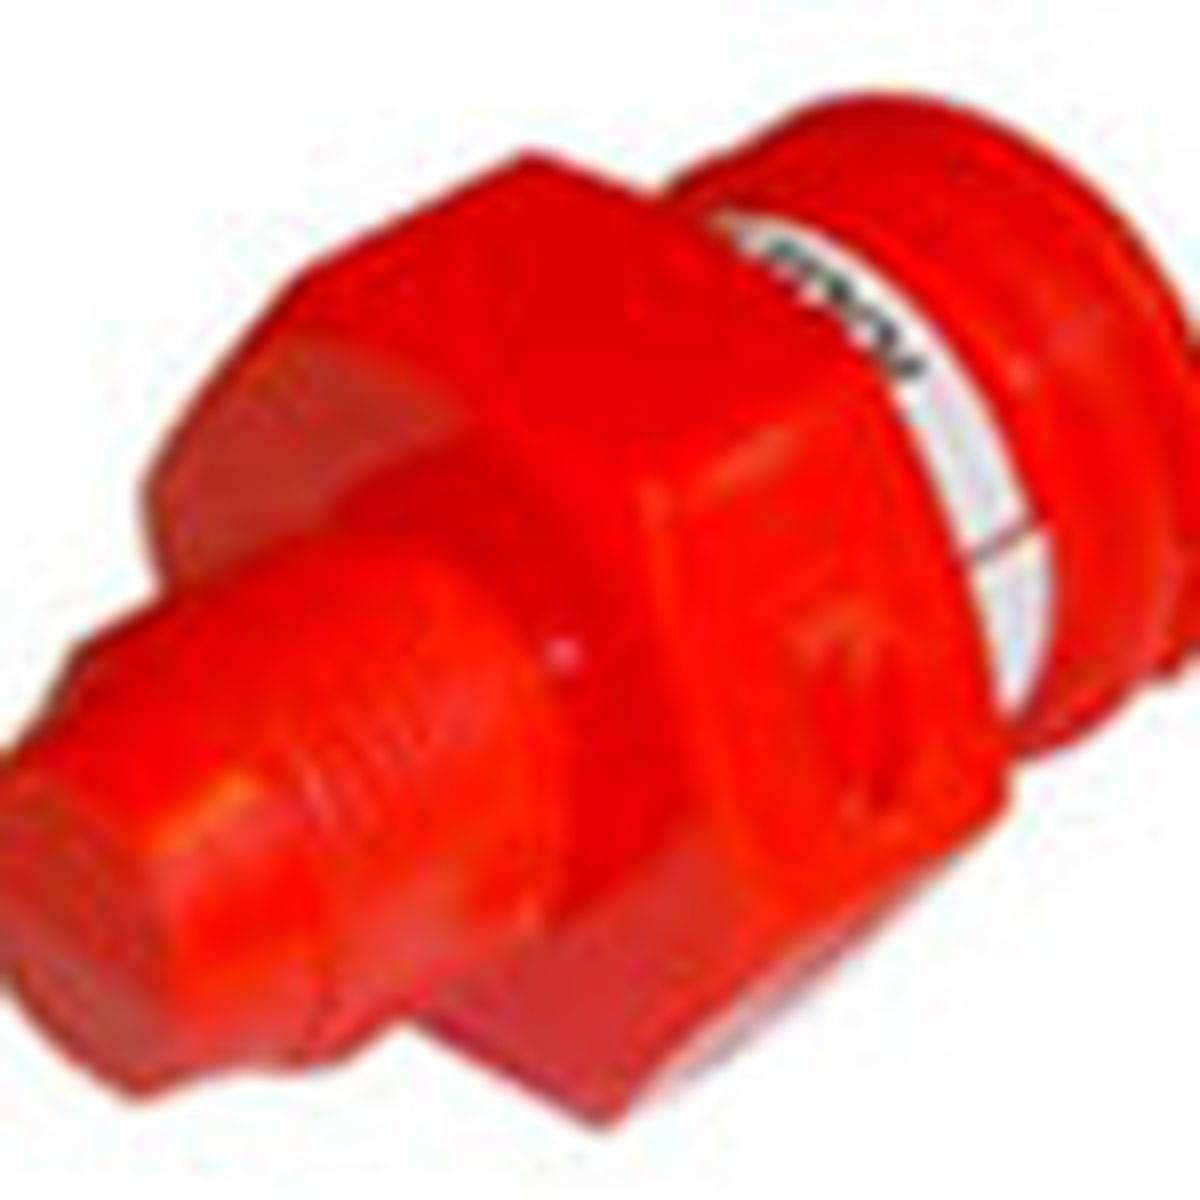 resetting tool for propane tank